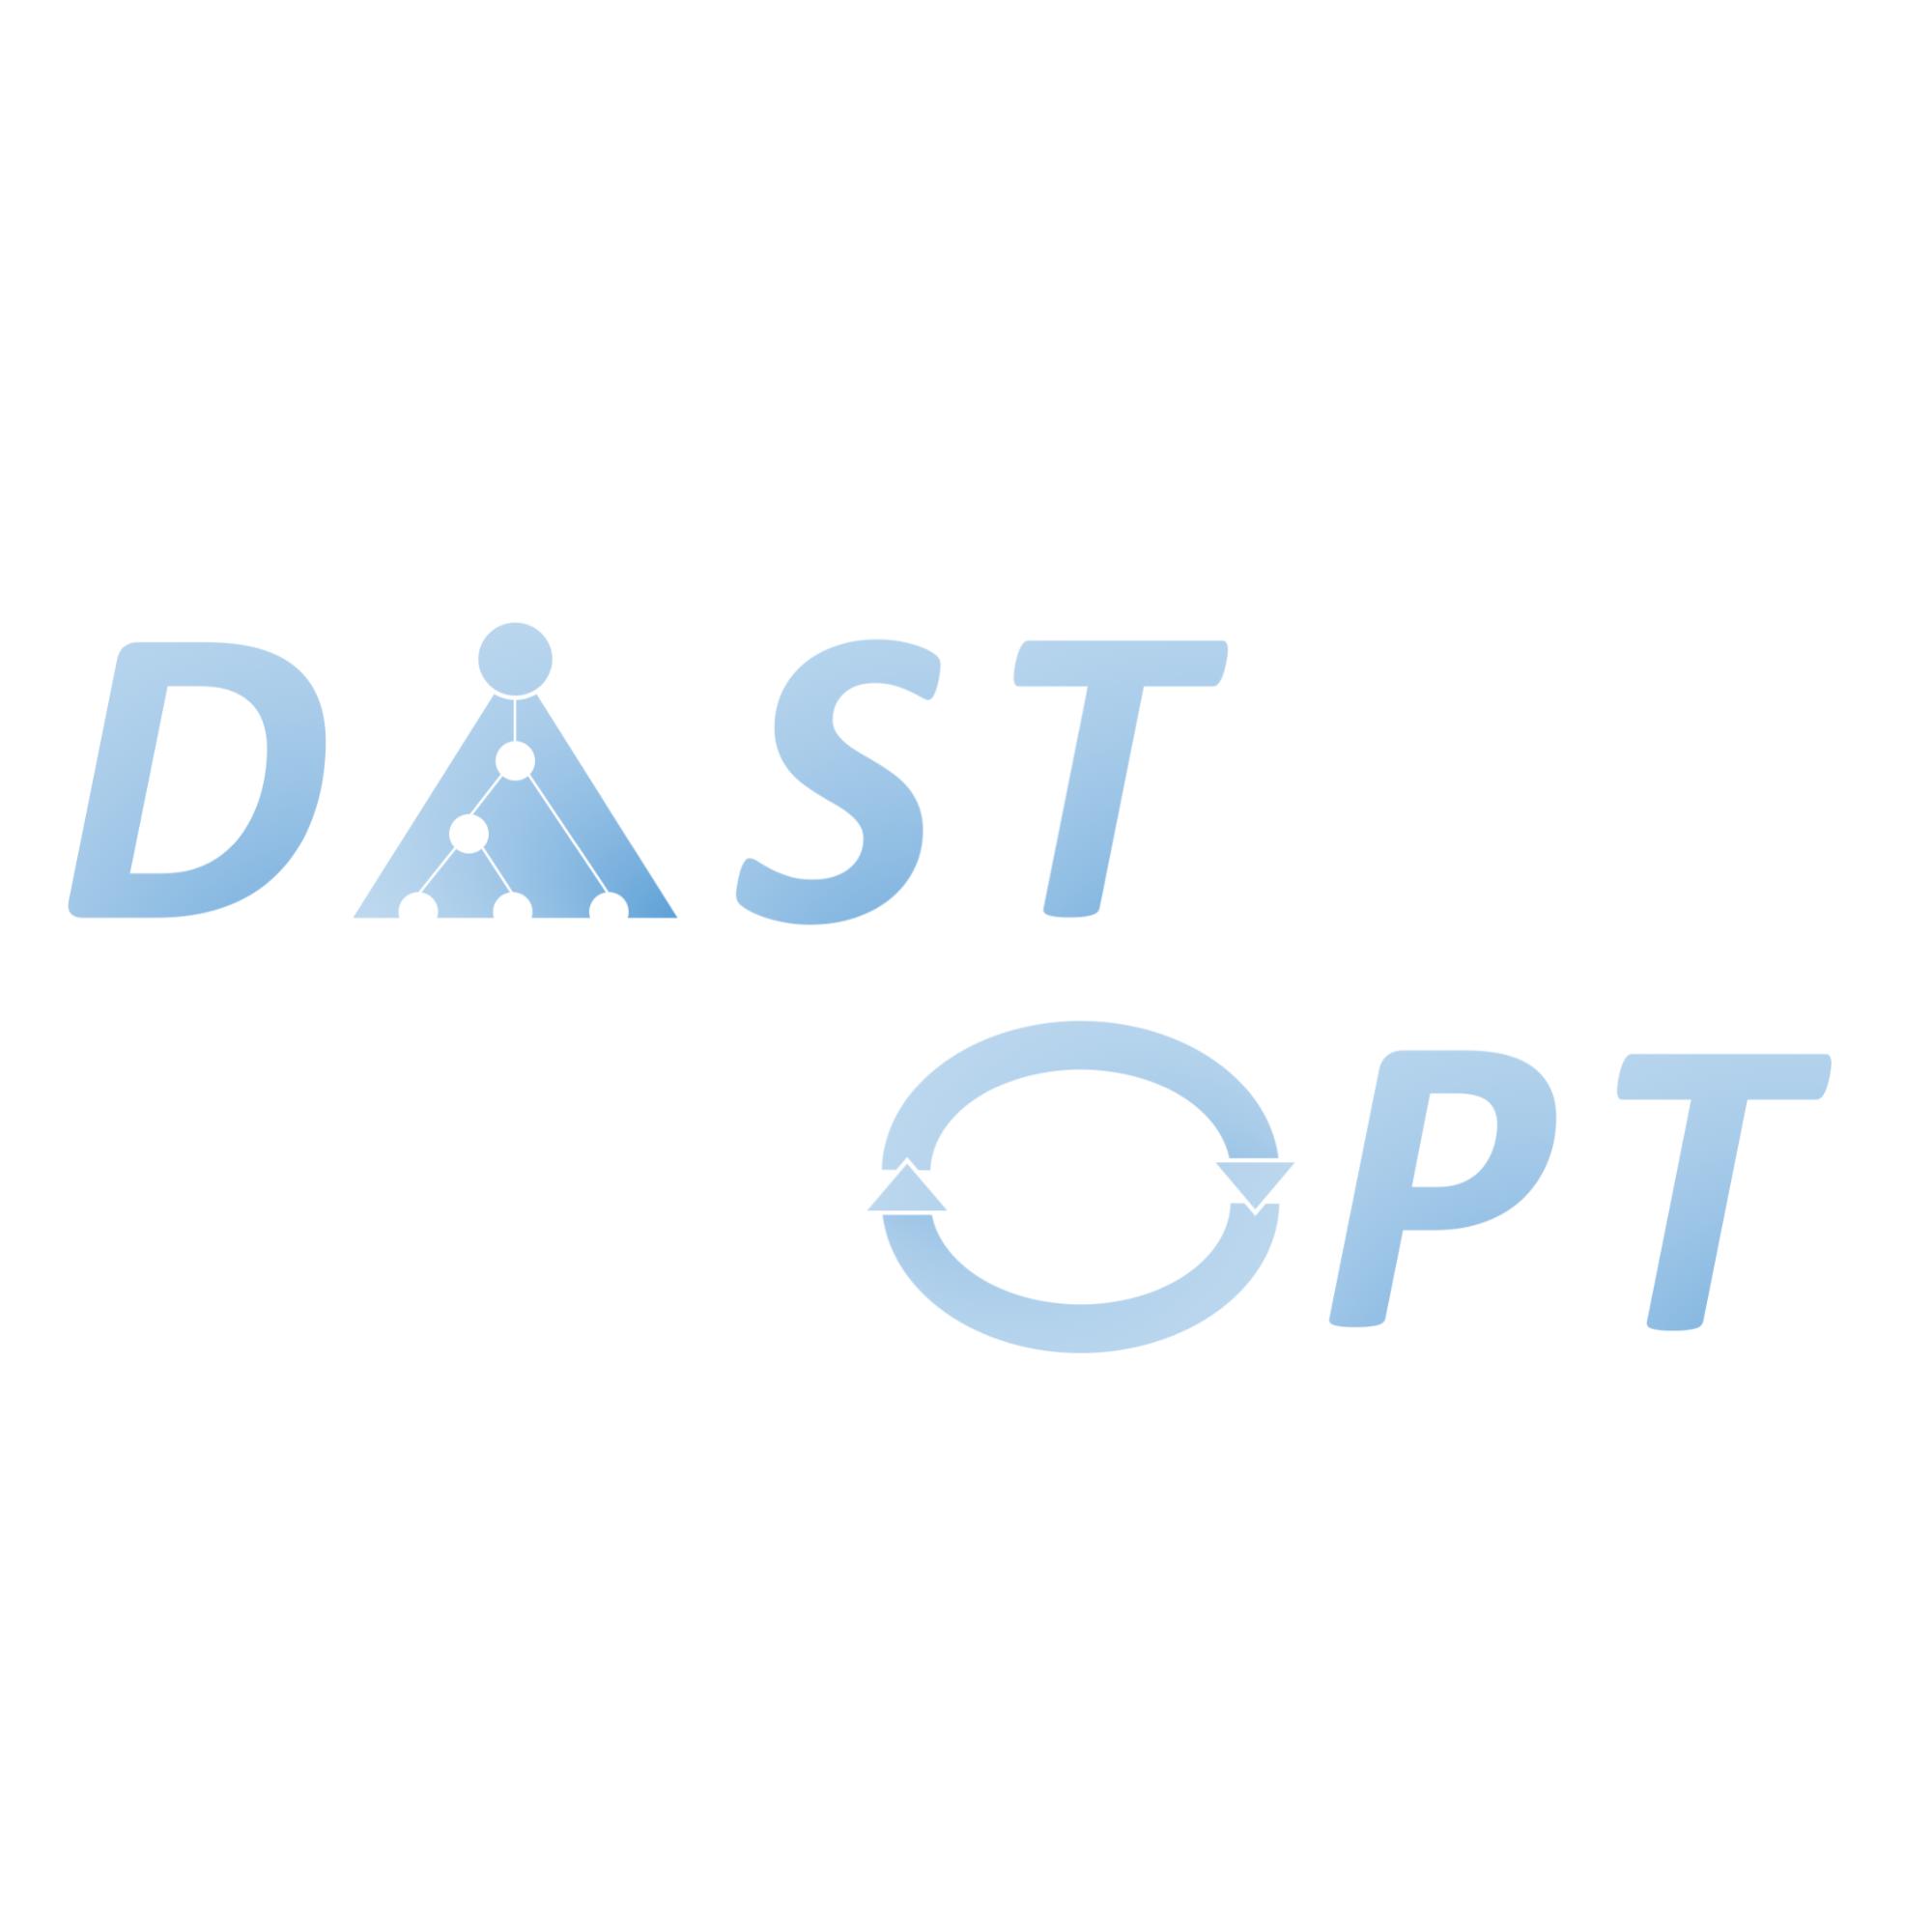 distopt-logo